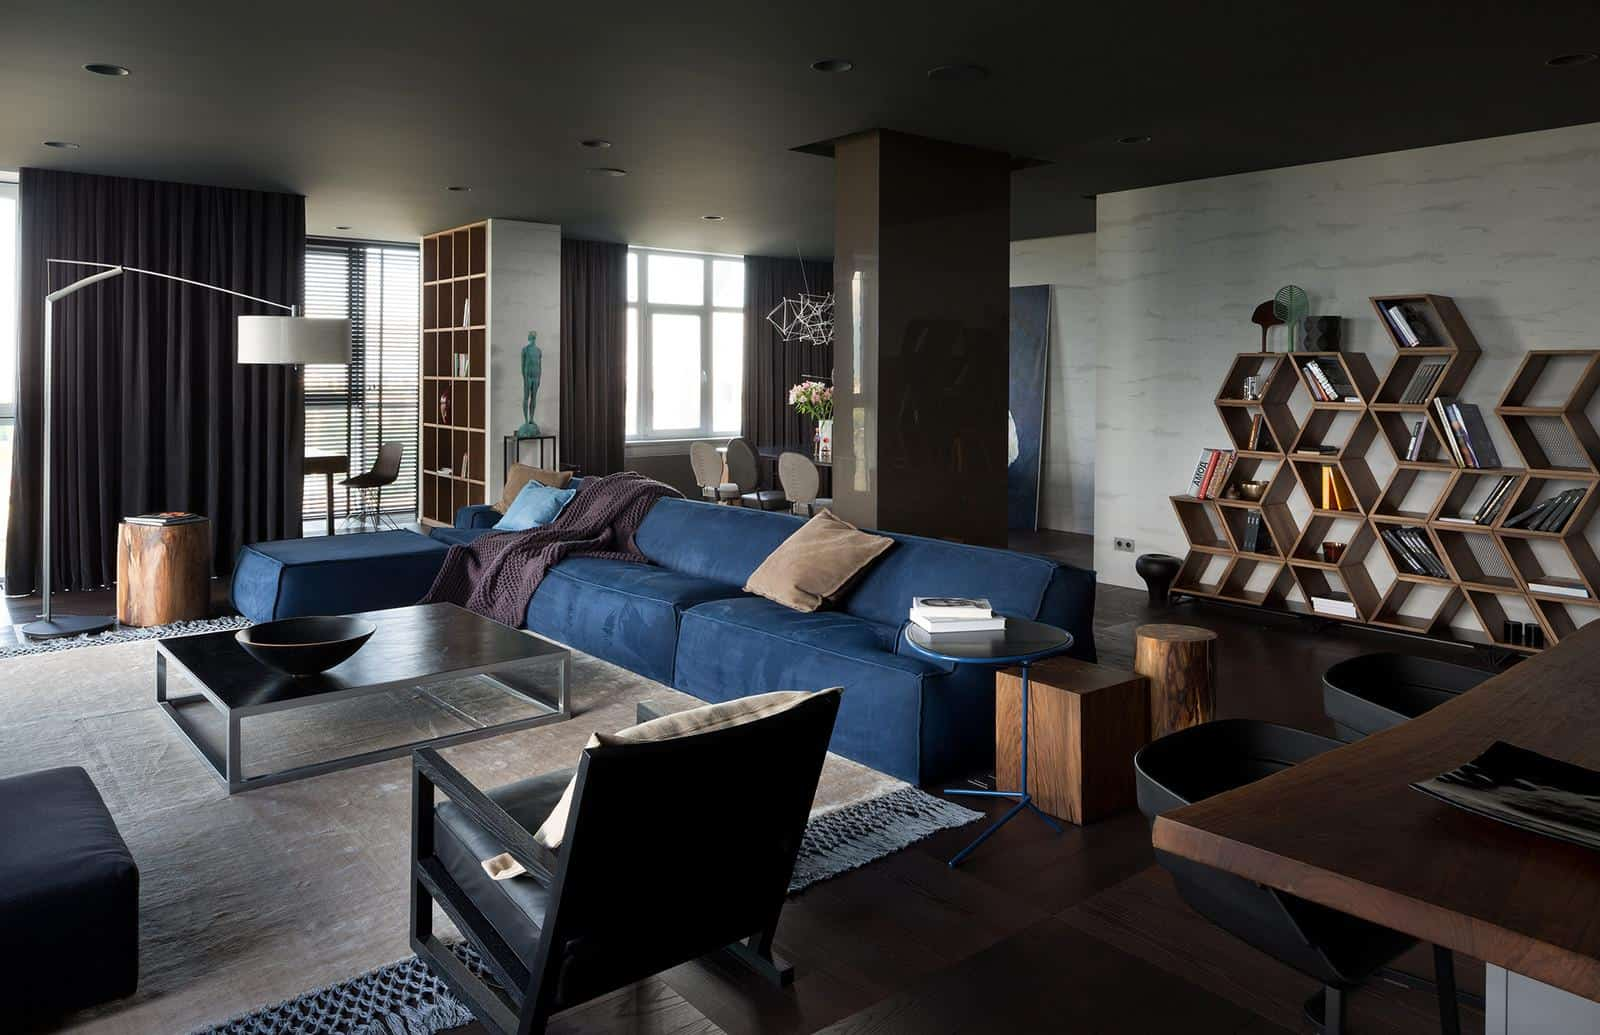 Dark brown and gray colo scheme for modern urbanistic open layour studio apartment